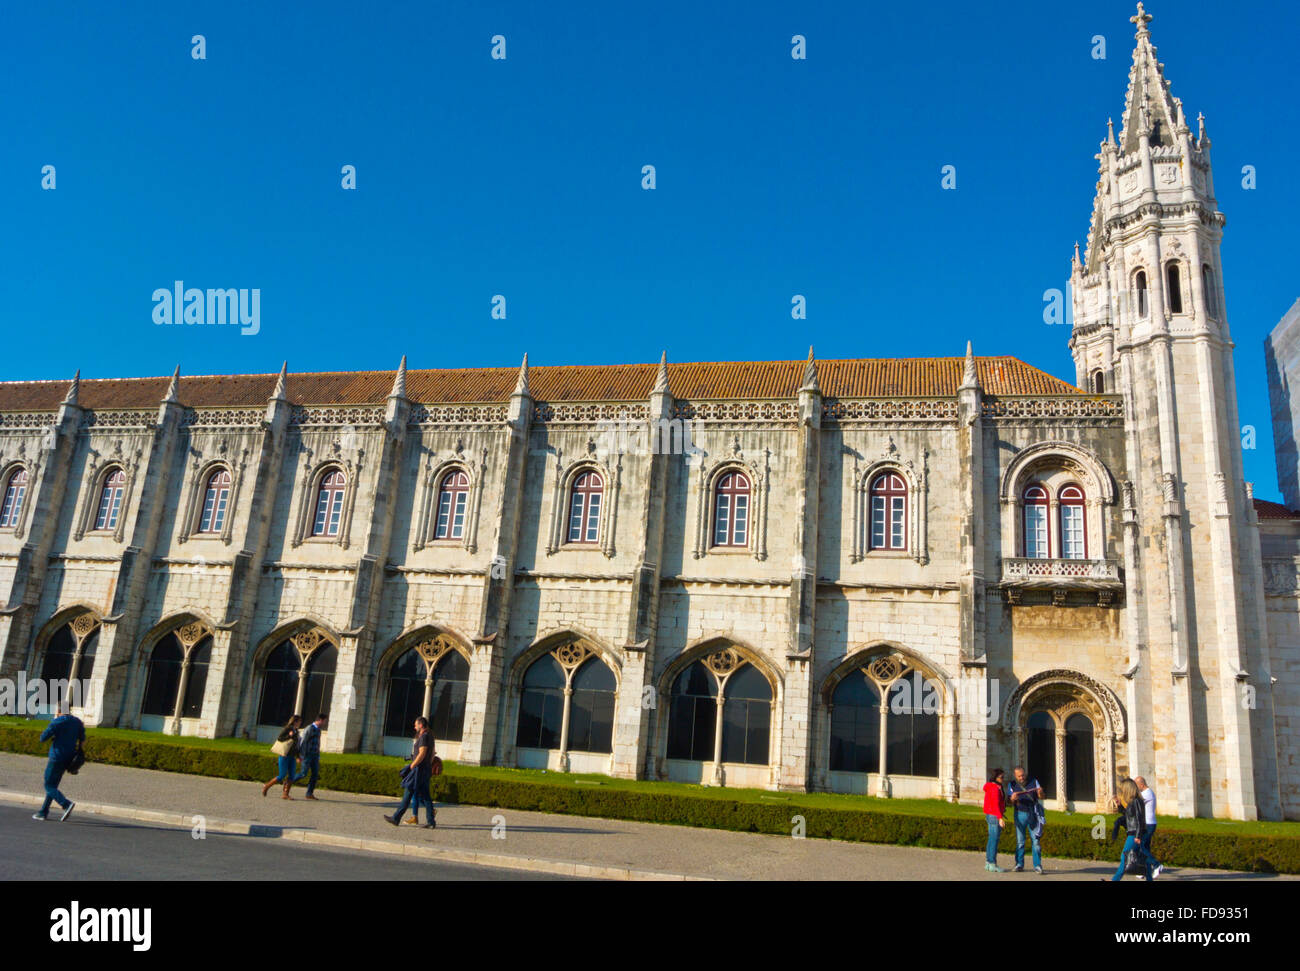 Torre Oca, Mosteiro dos Jerónimos, Jeronimos monastery, Belem, Lisbon, Portugal - Stock Image